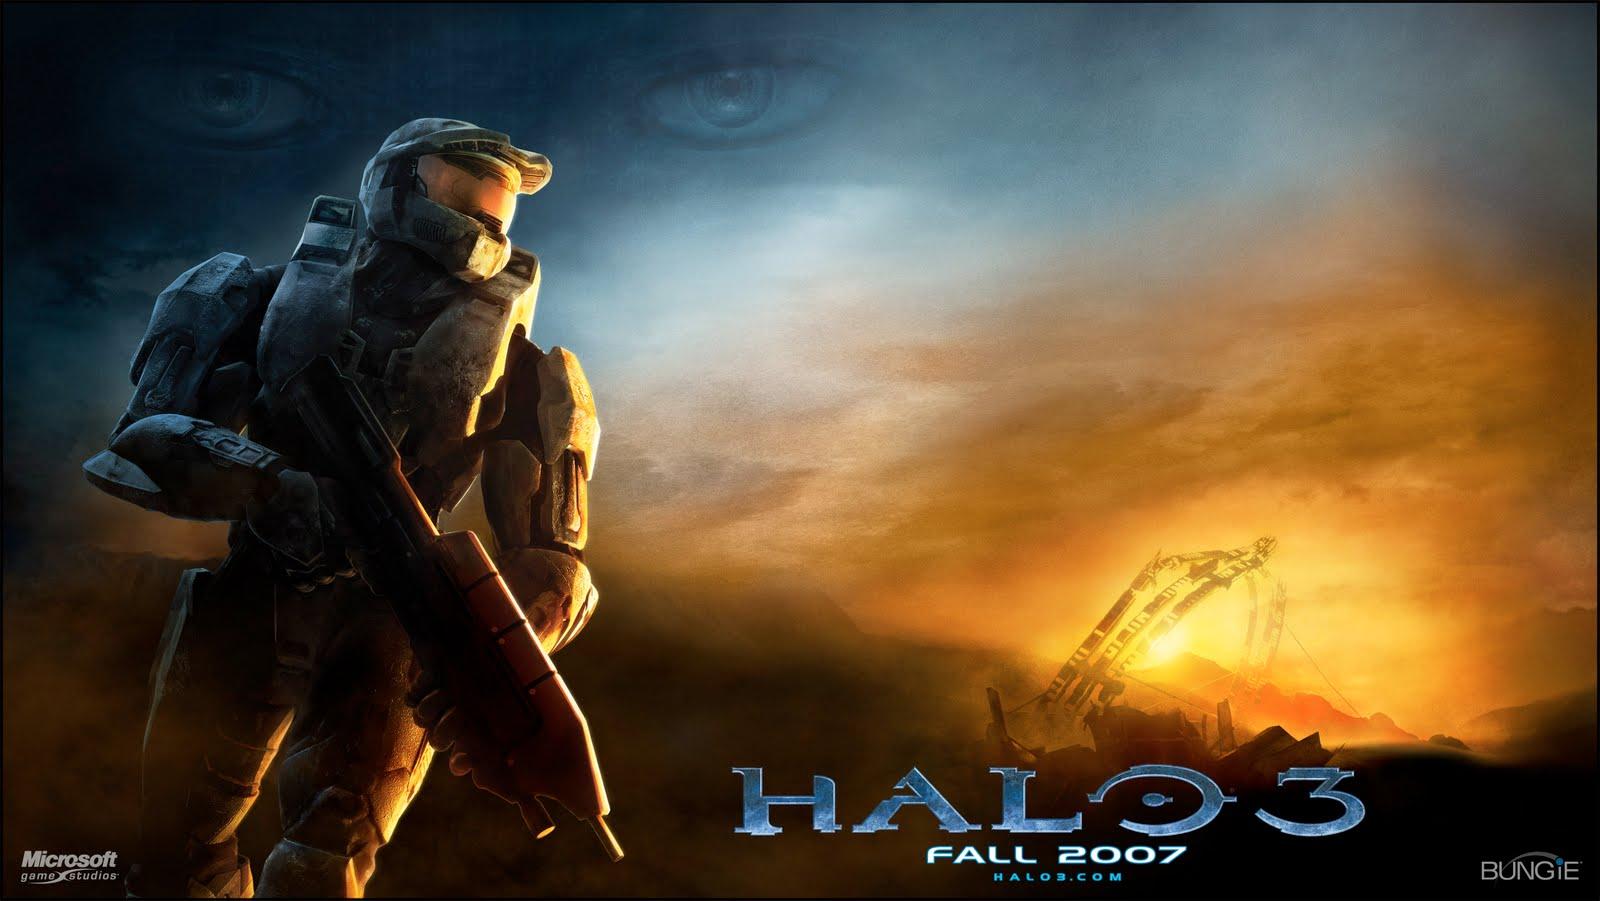 Girl Gta Wallpapers Click To See World Halo 3 Wallpaper 1080p